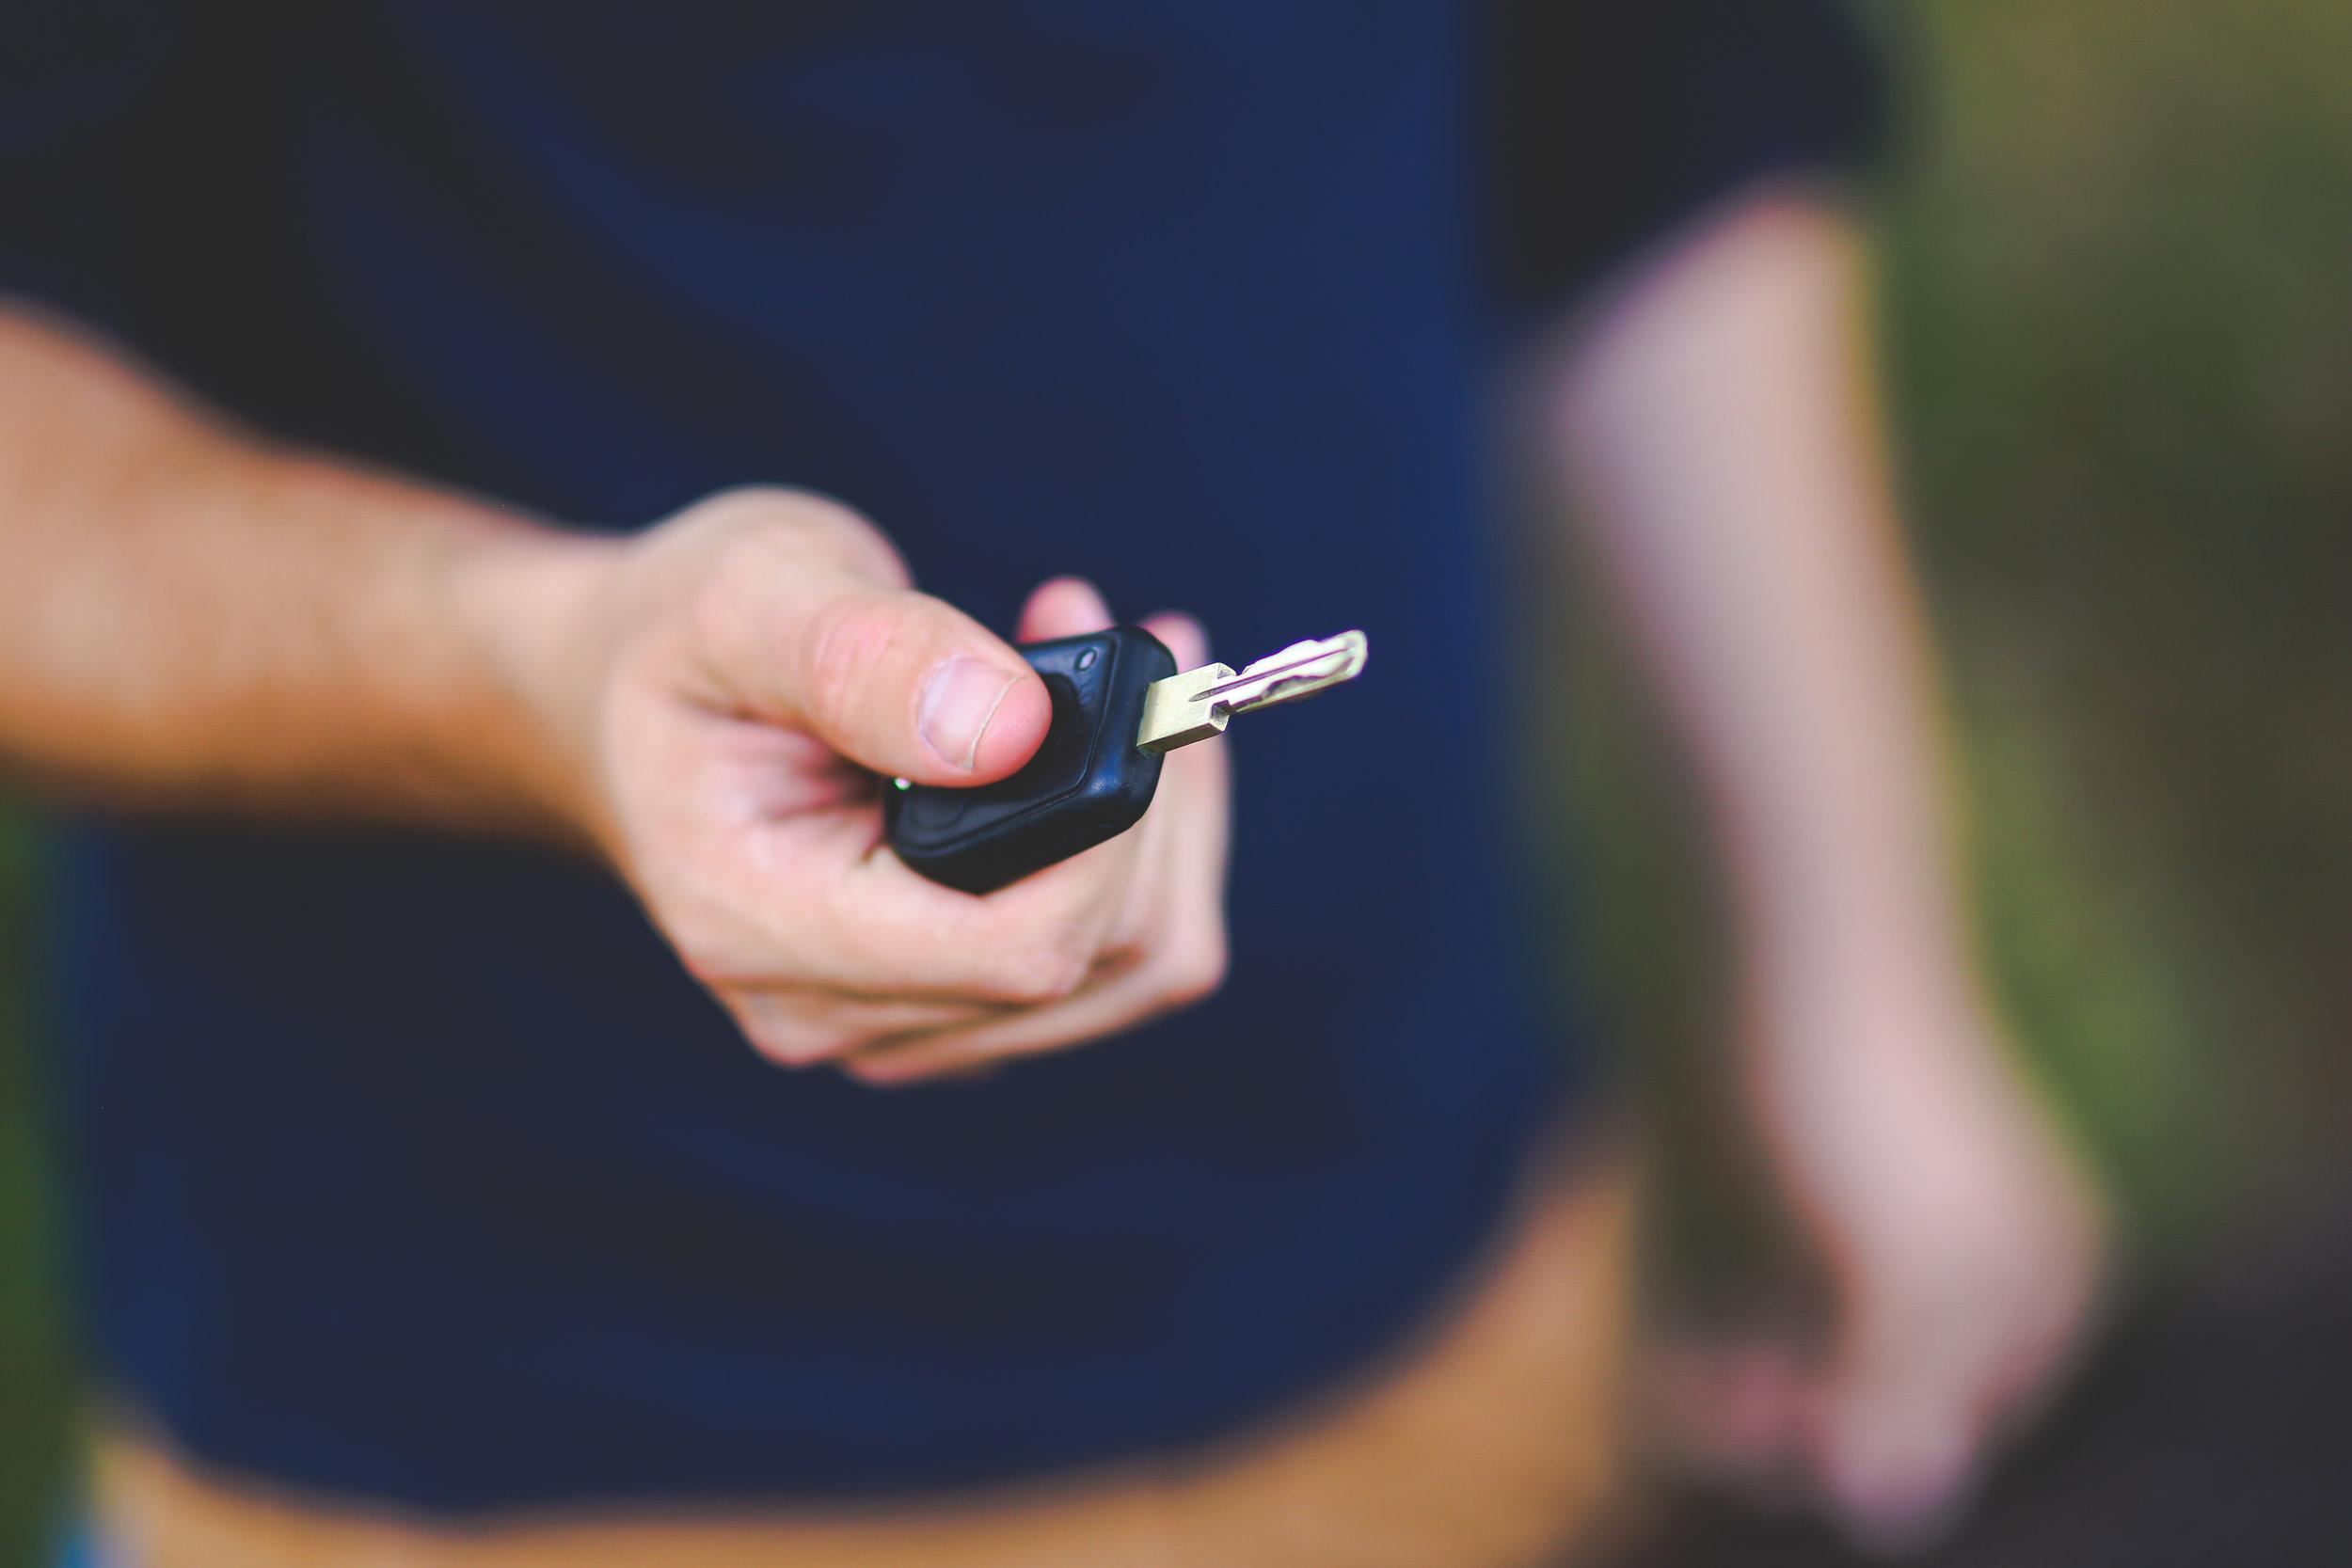 man-people-hand-driving-6097.jpg